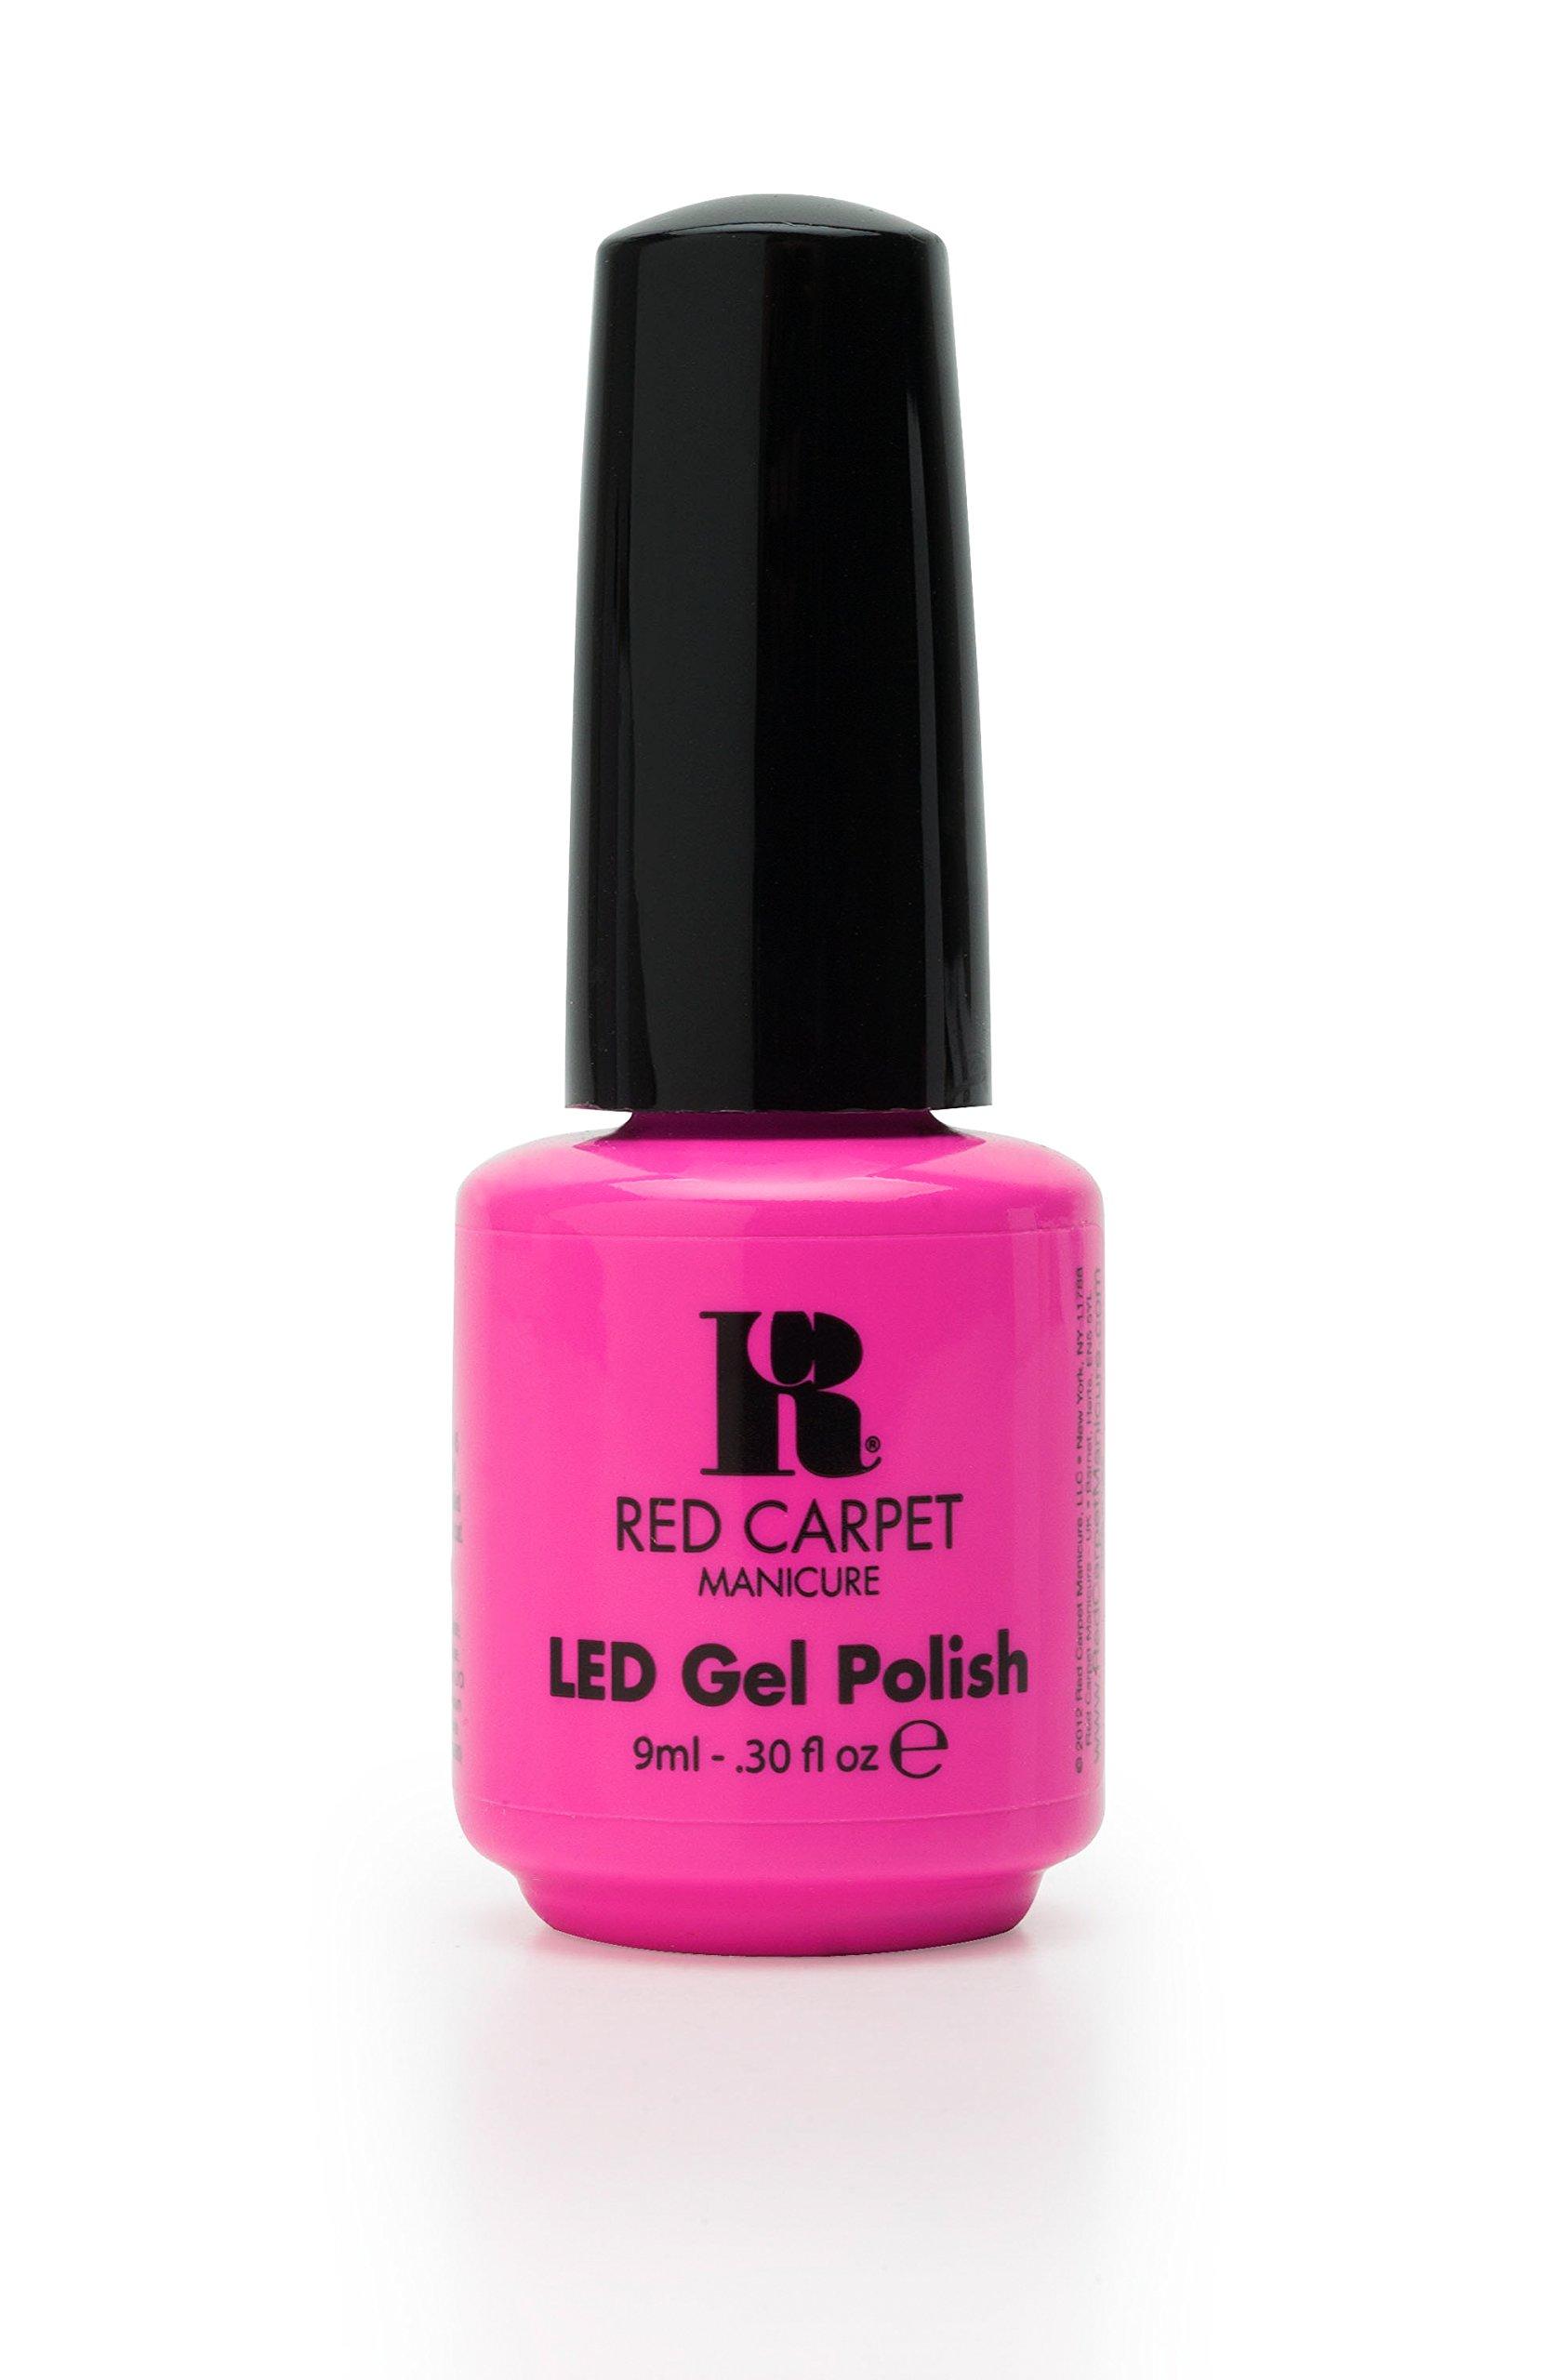 Red Carpet Manicure Gel Polish, Star Power, 0.3 Fluid Ounce